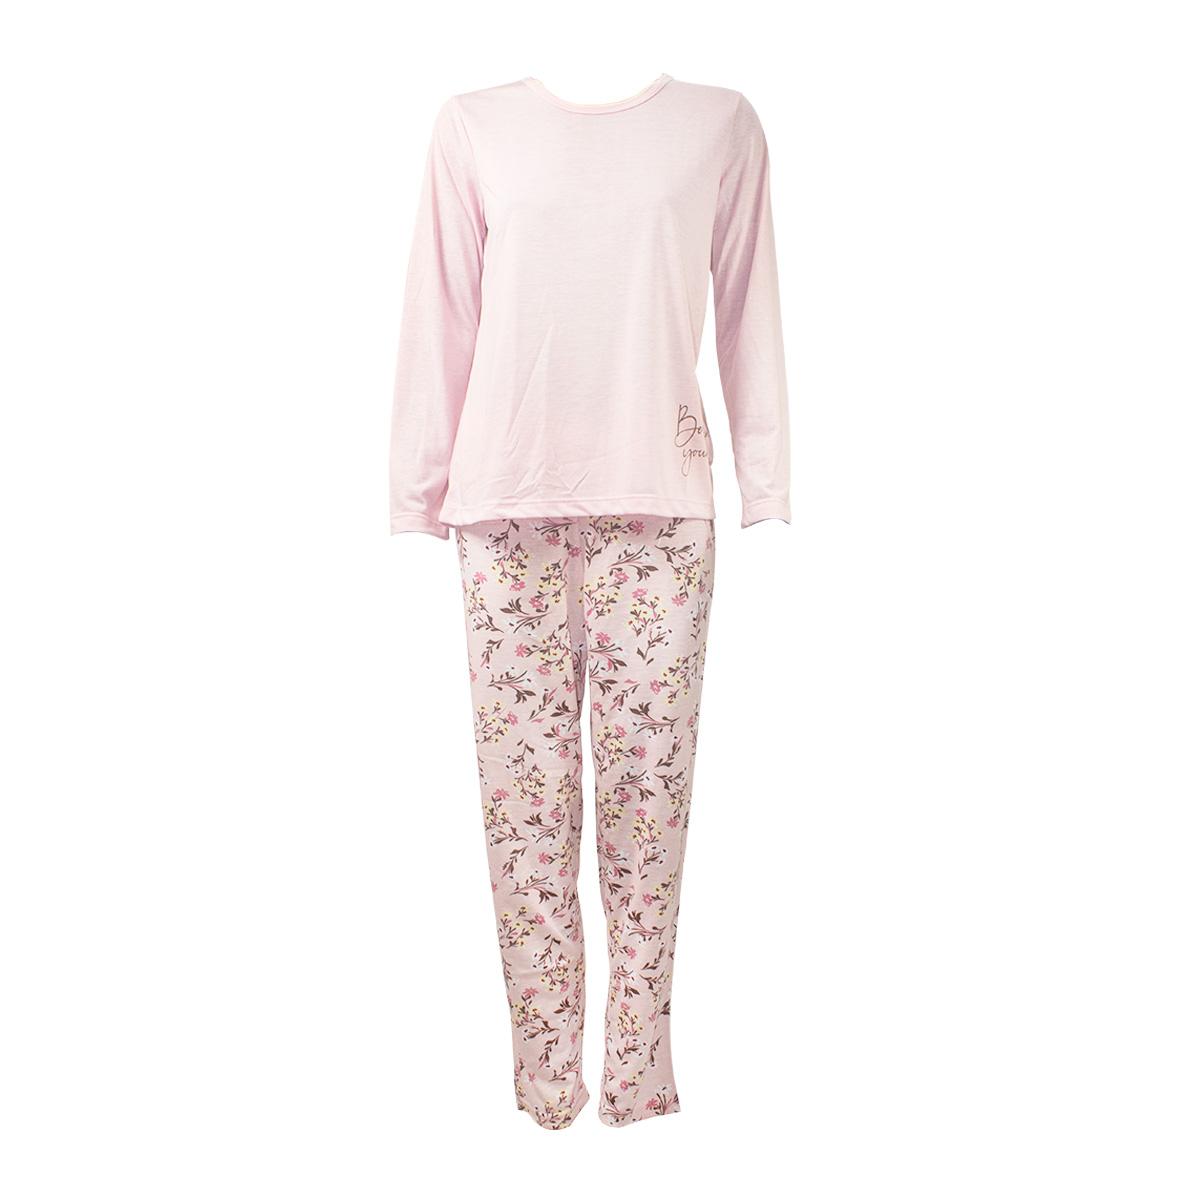 Pijama Calça Floral  Longo Fechado Feminino Mardelle